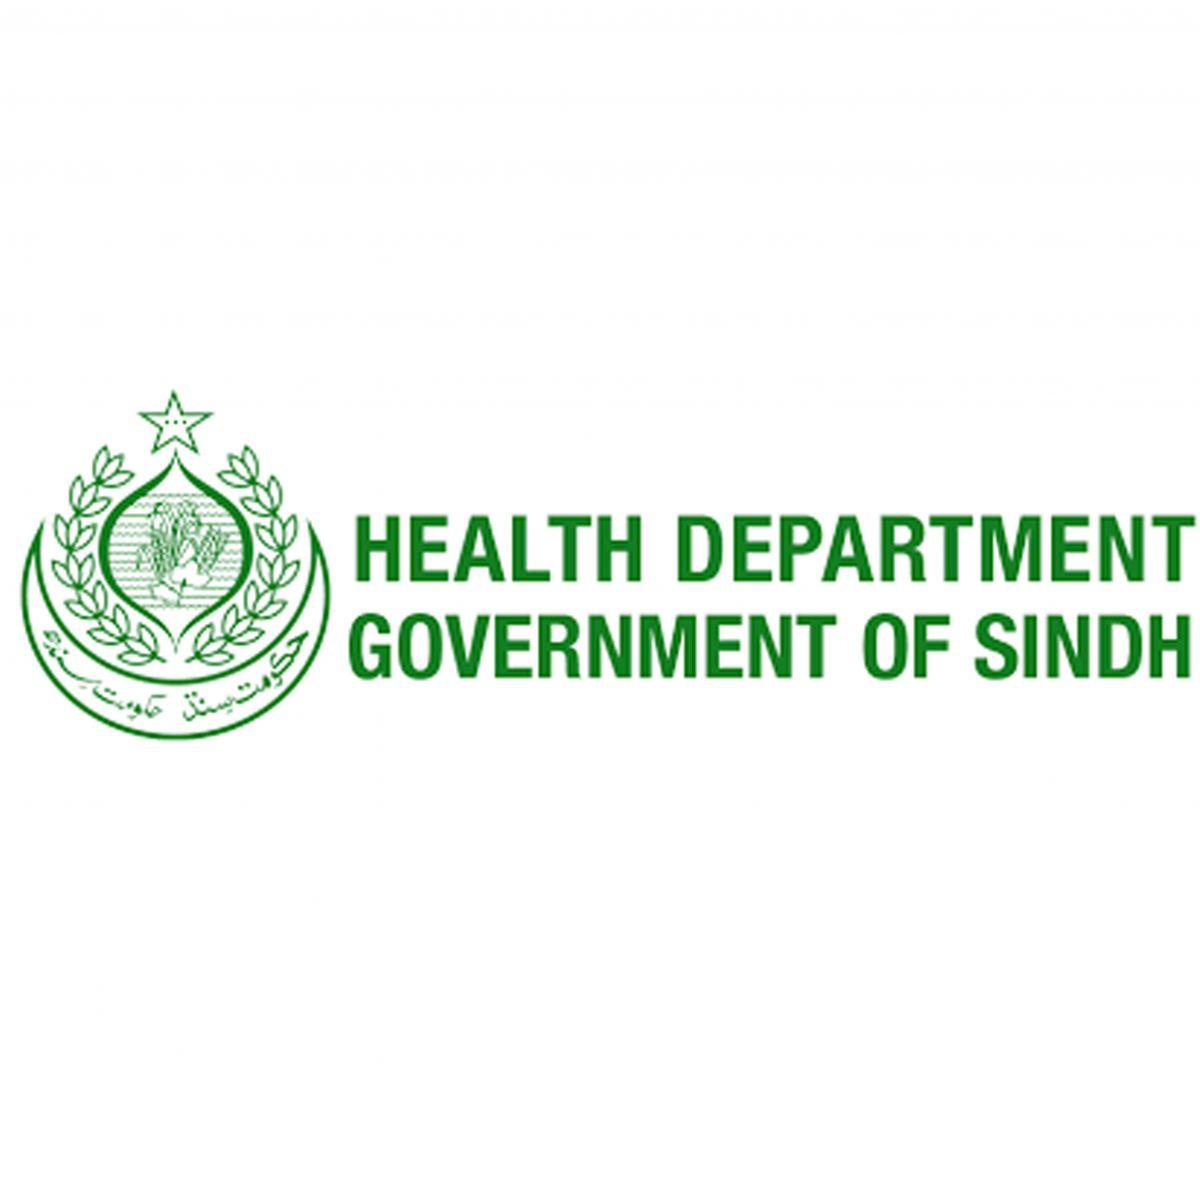 Health Department Govt of Sindh